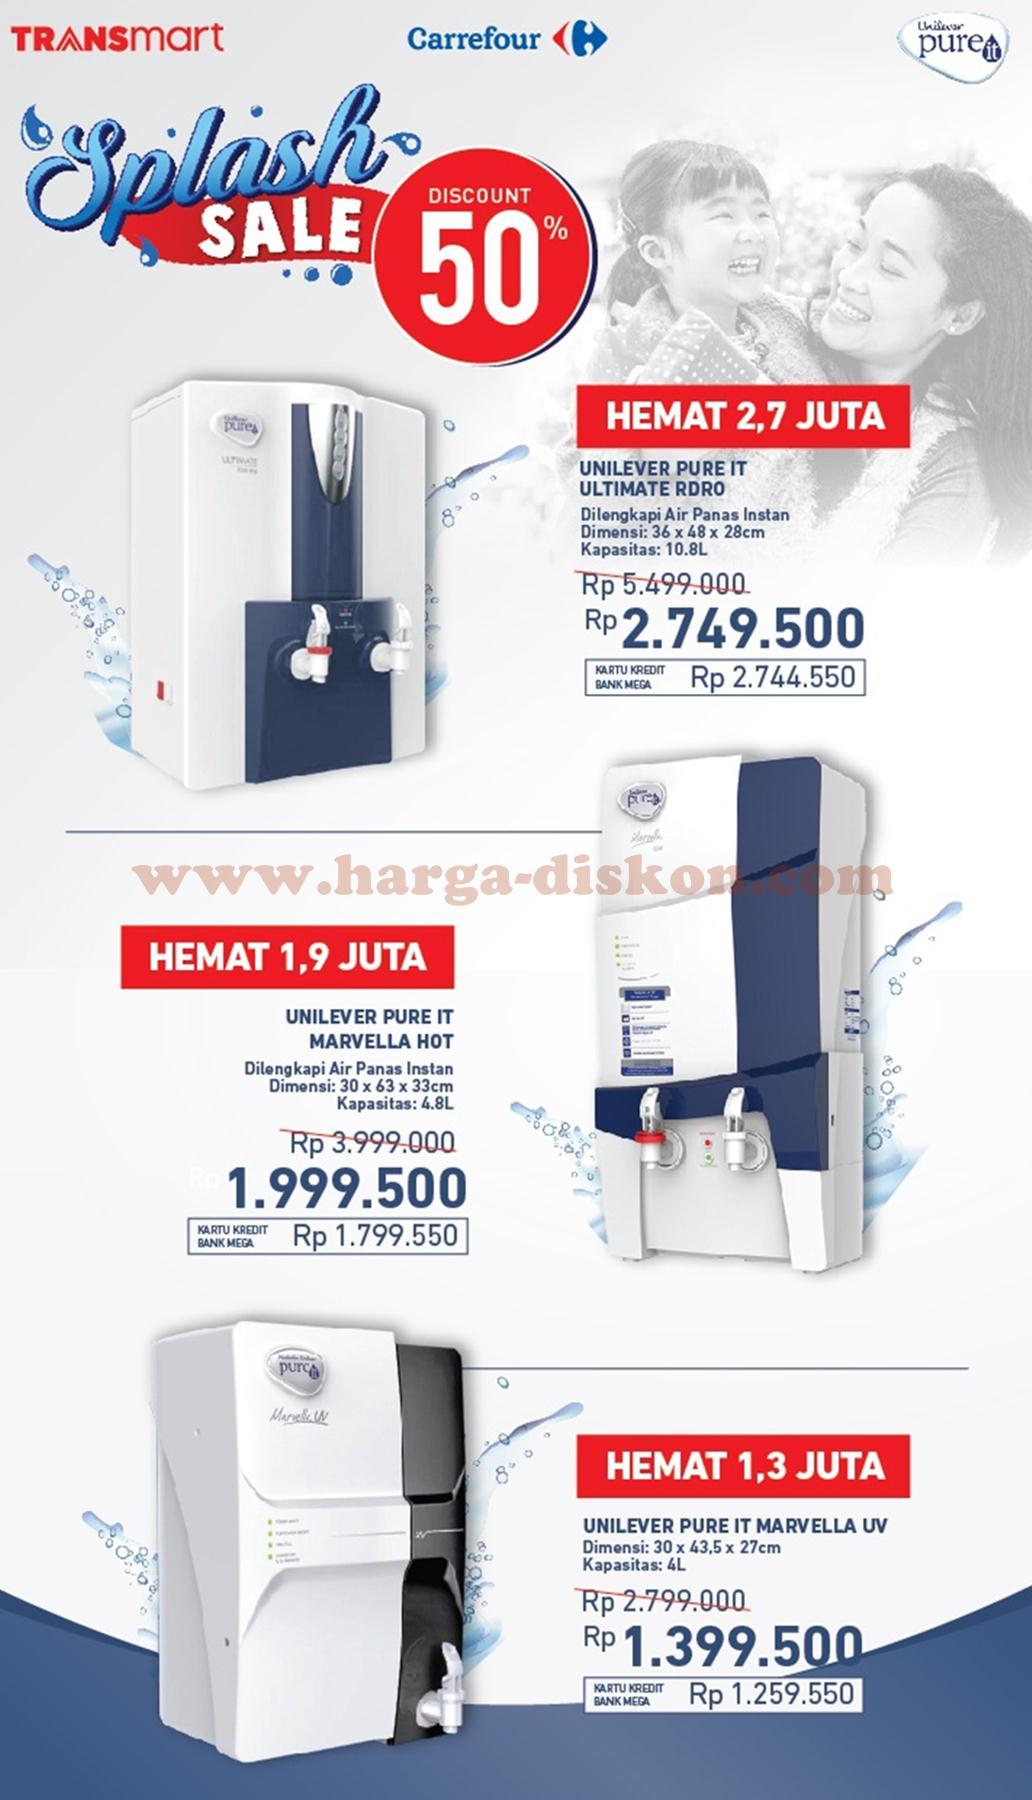 Promo Carrefour Splash Sale Diskon 50 Pure It Periode 10 12 Agustus 2018 Harga Diskon